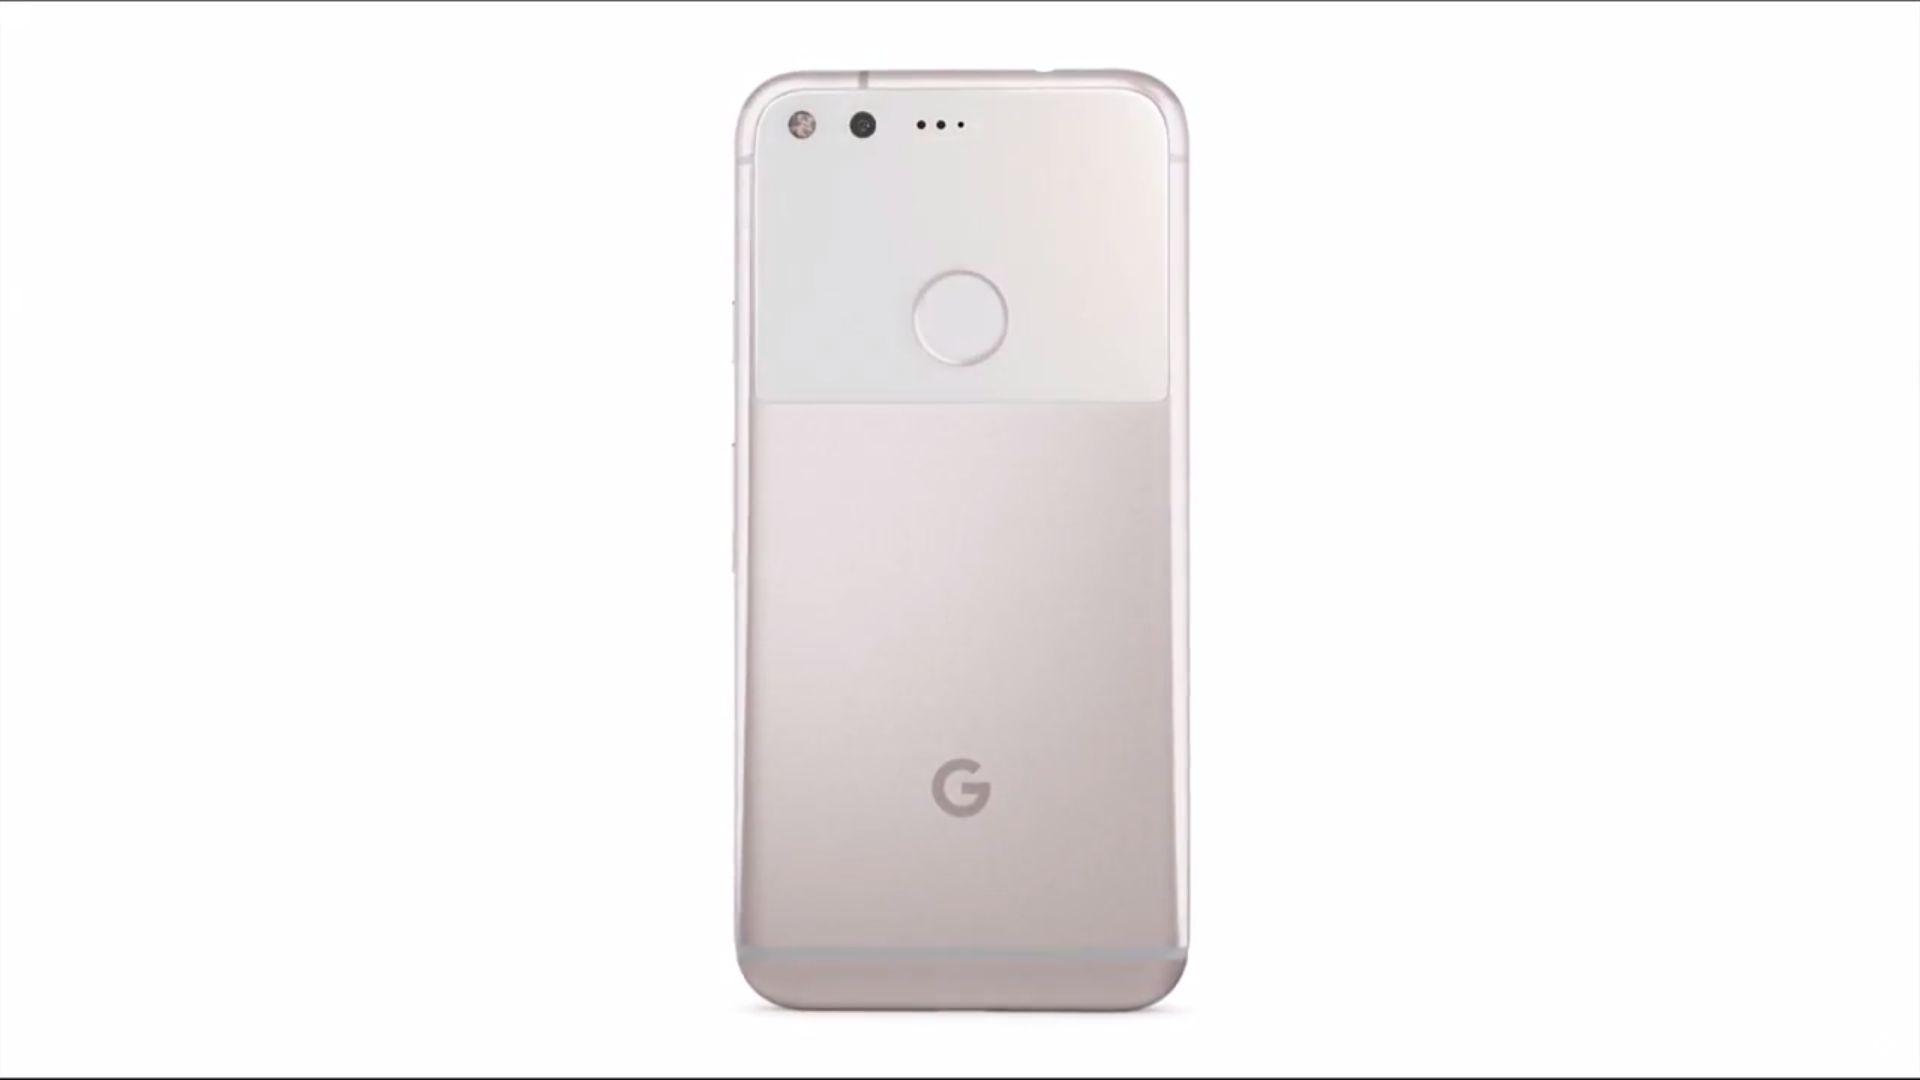 Move over Nexus, here comes Google Pixel